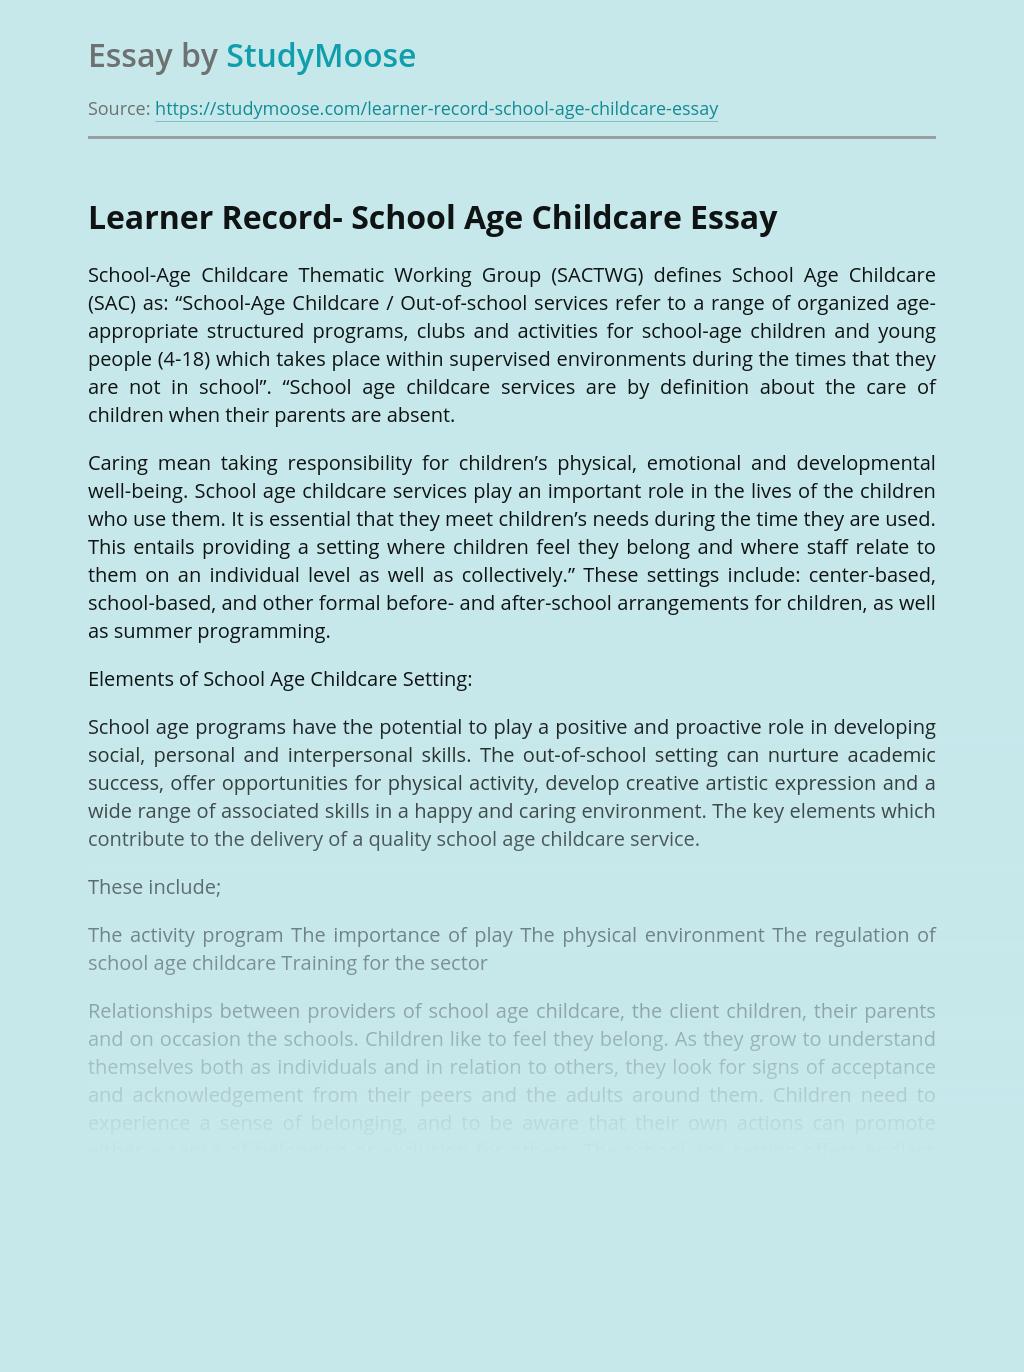 Learner Record- School Age Childcare